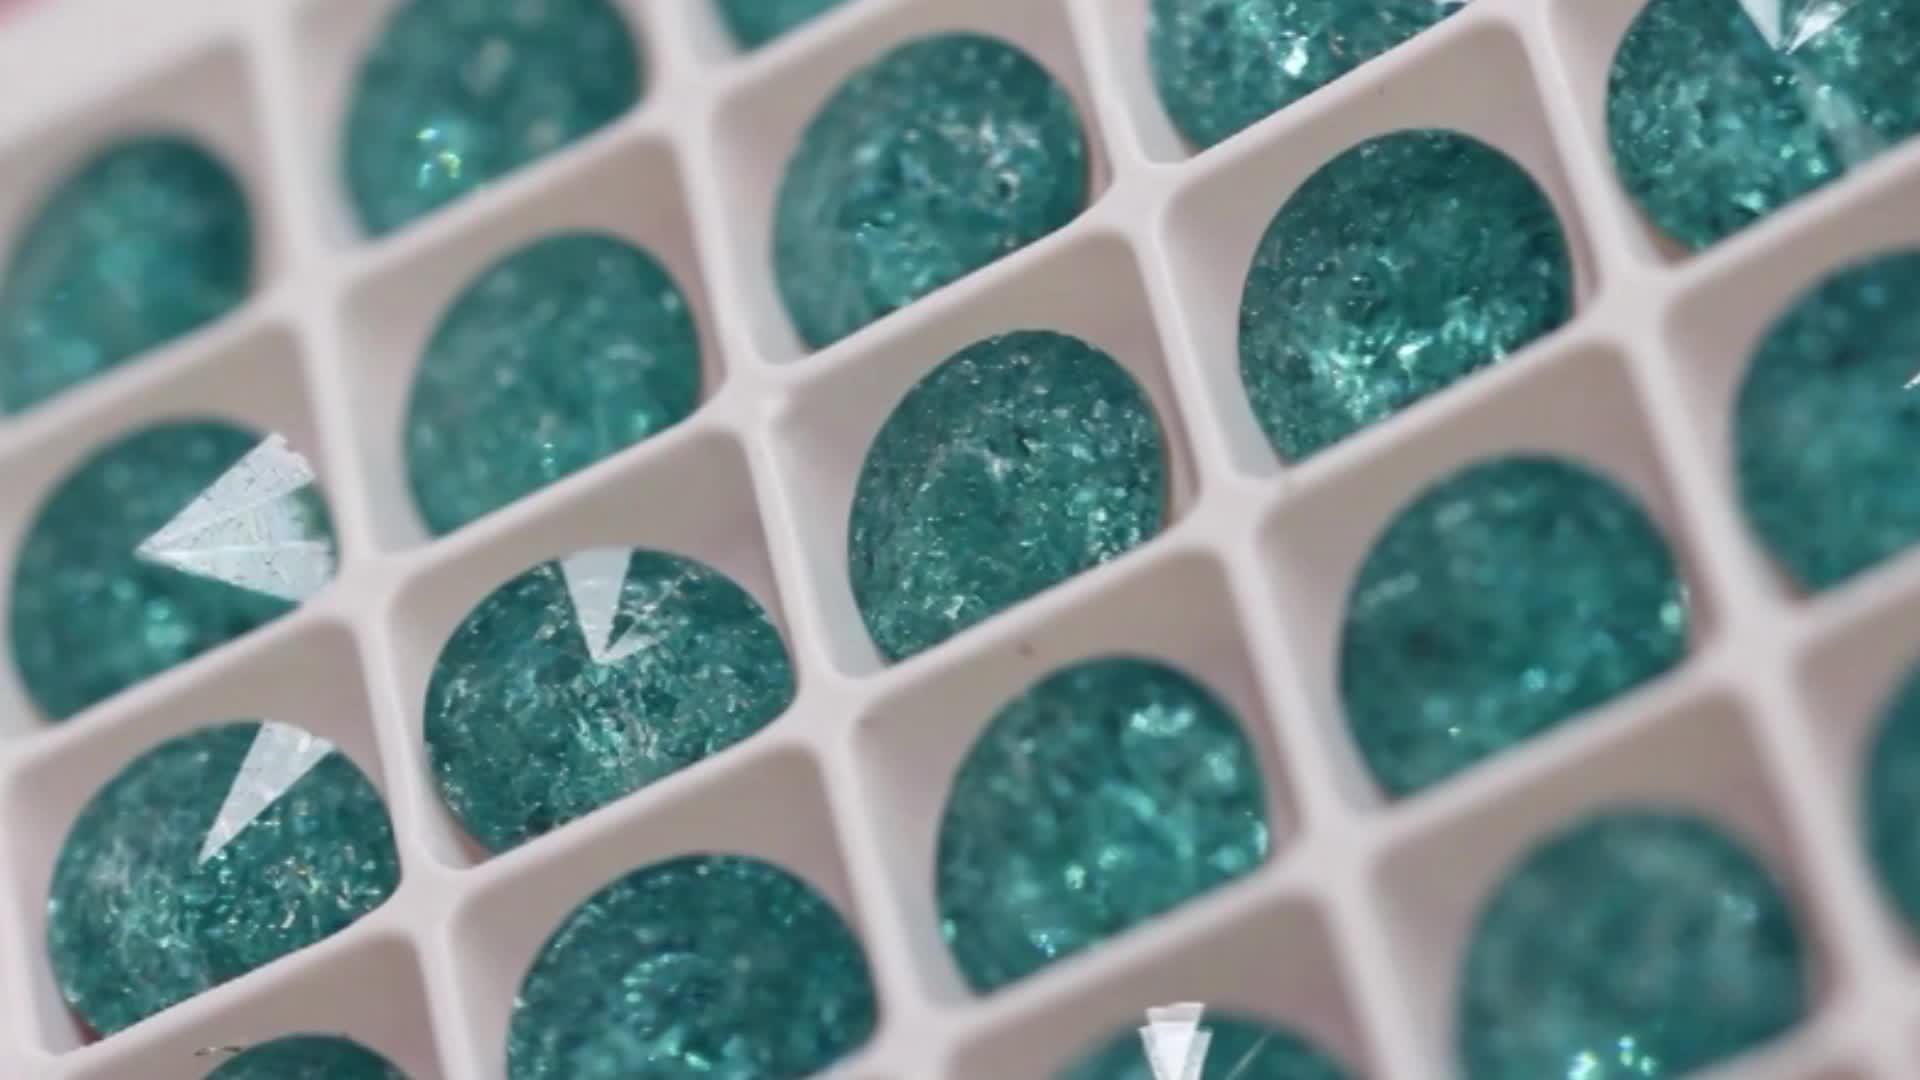 2019 IC Series Color Rivoli Point Back Fancy Stones Glass Rhinestones for Handmade Craft